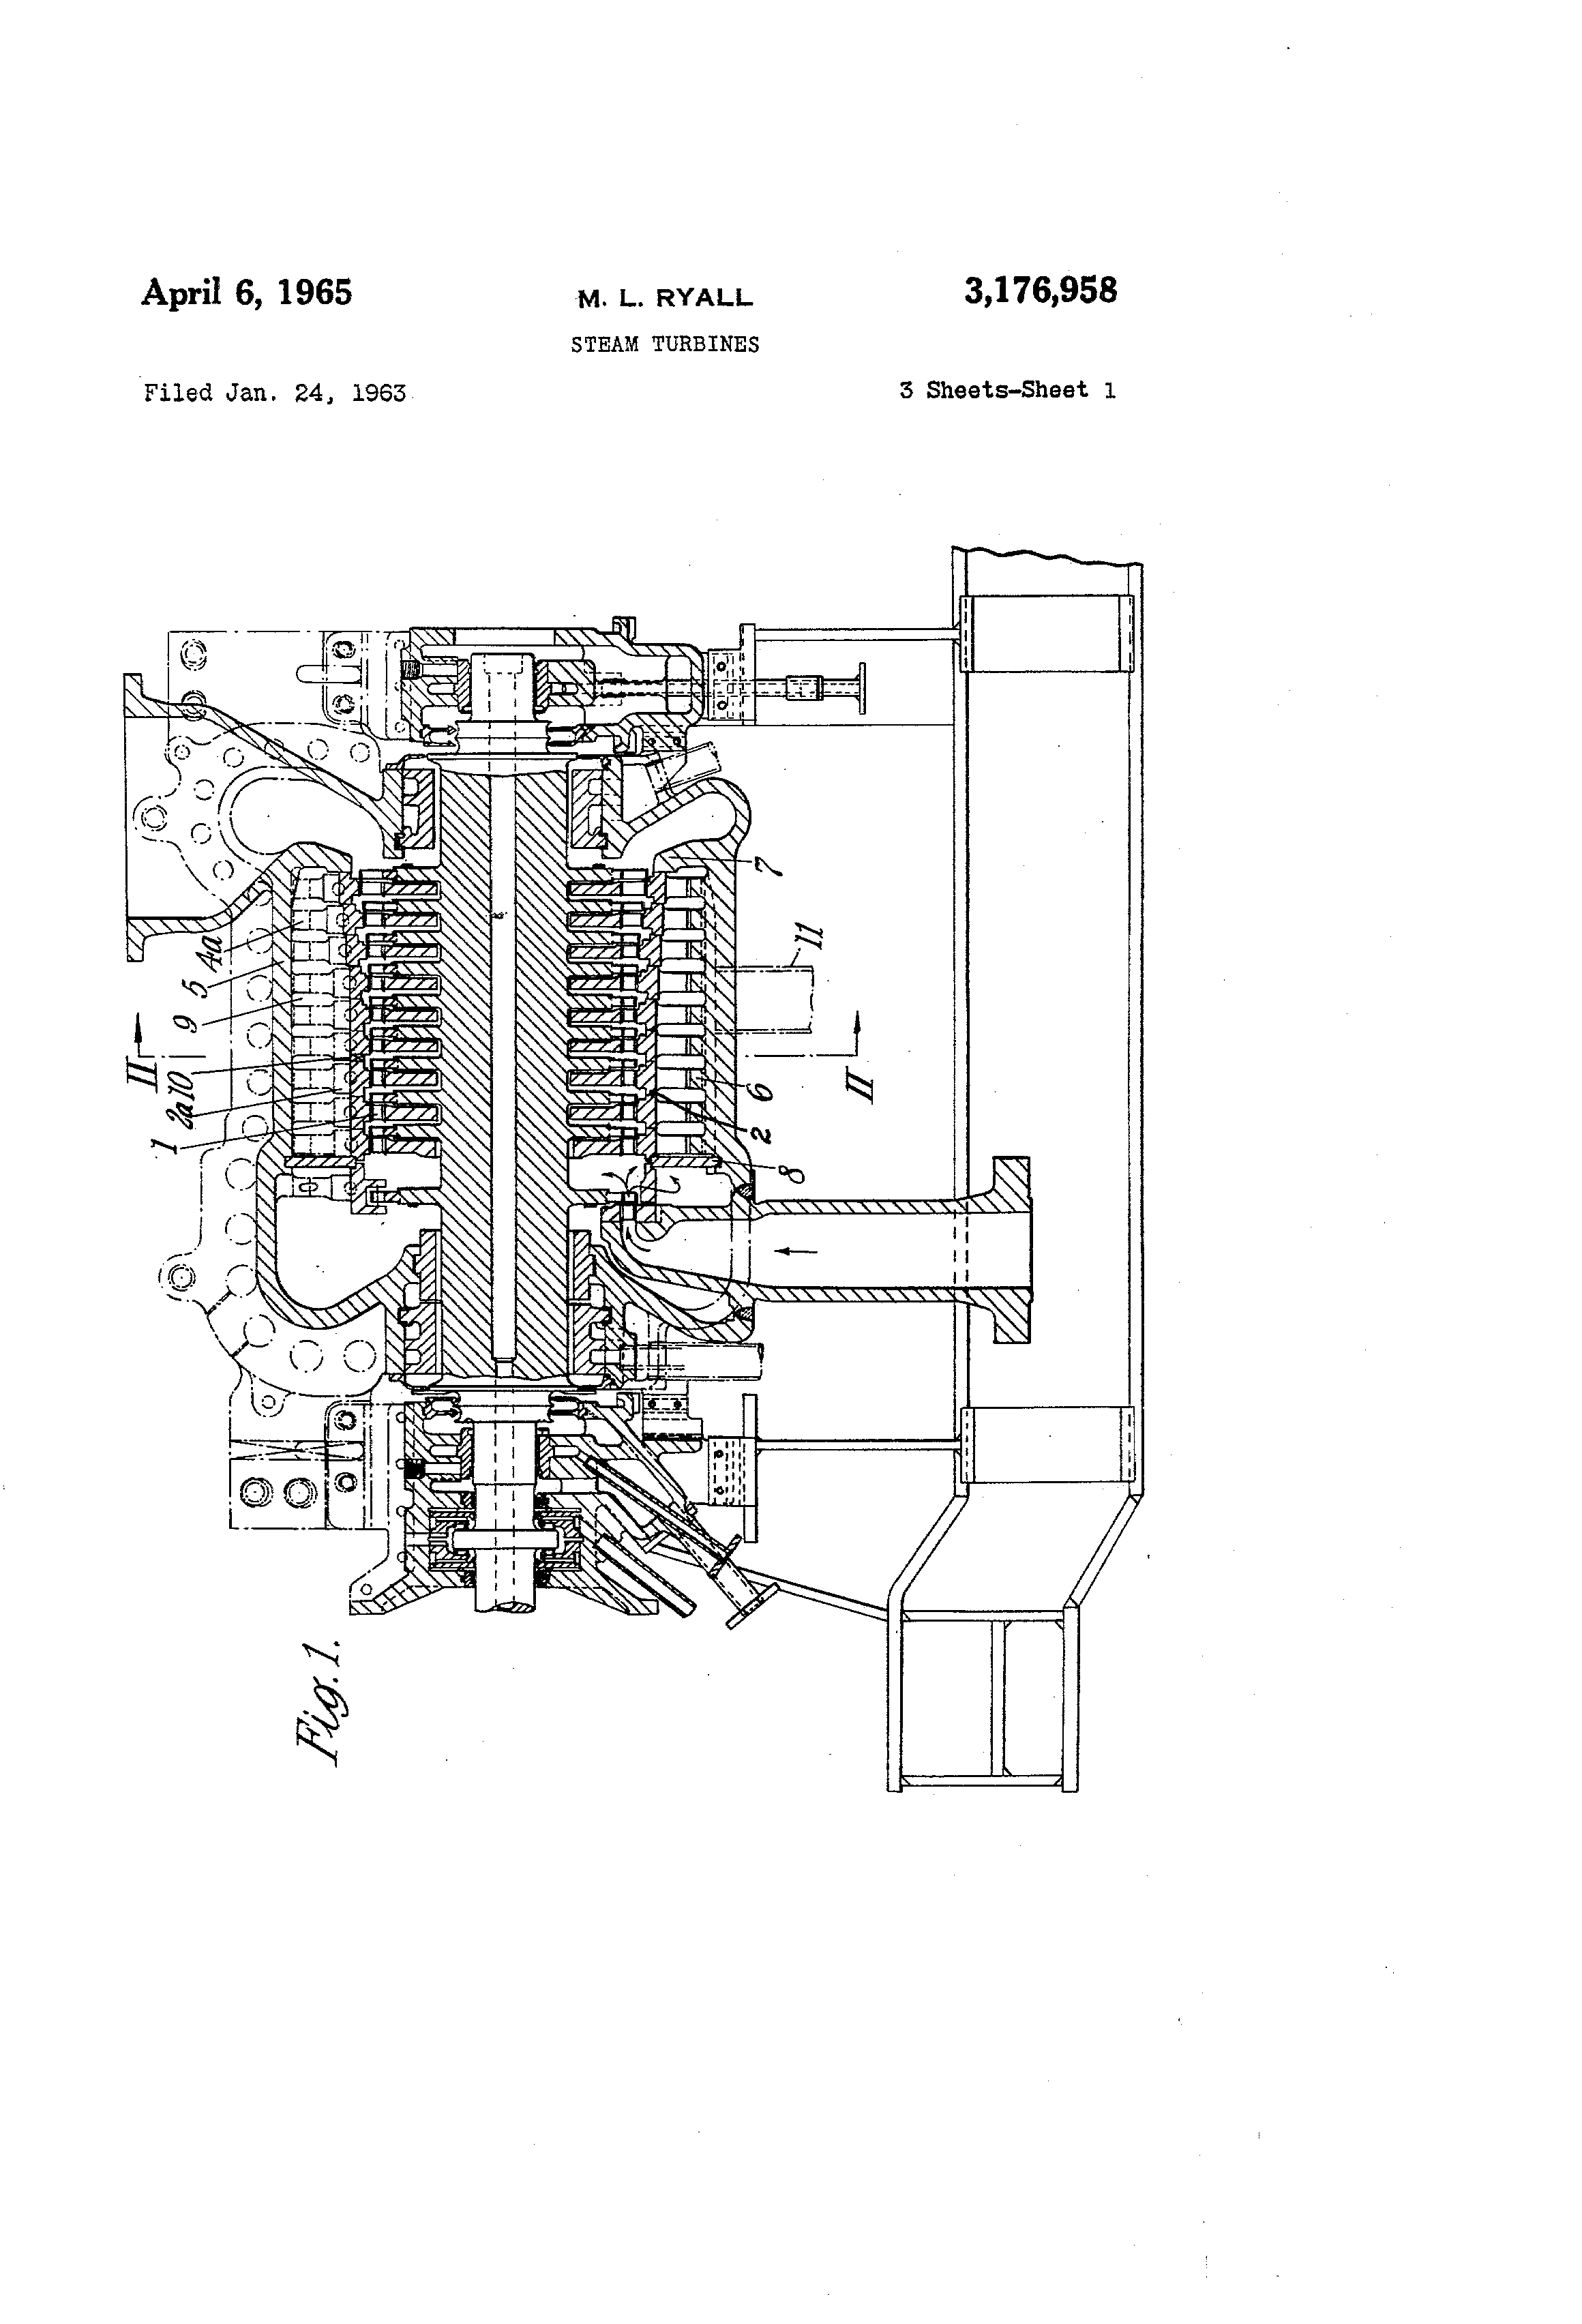 Patent US Steam turbines Google Patents